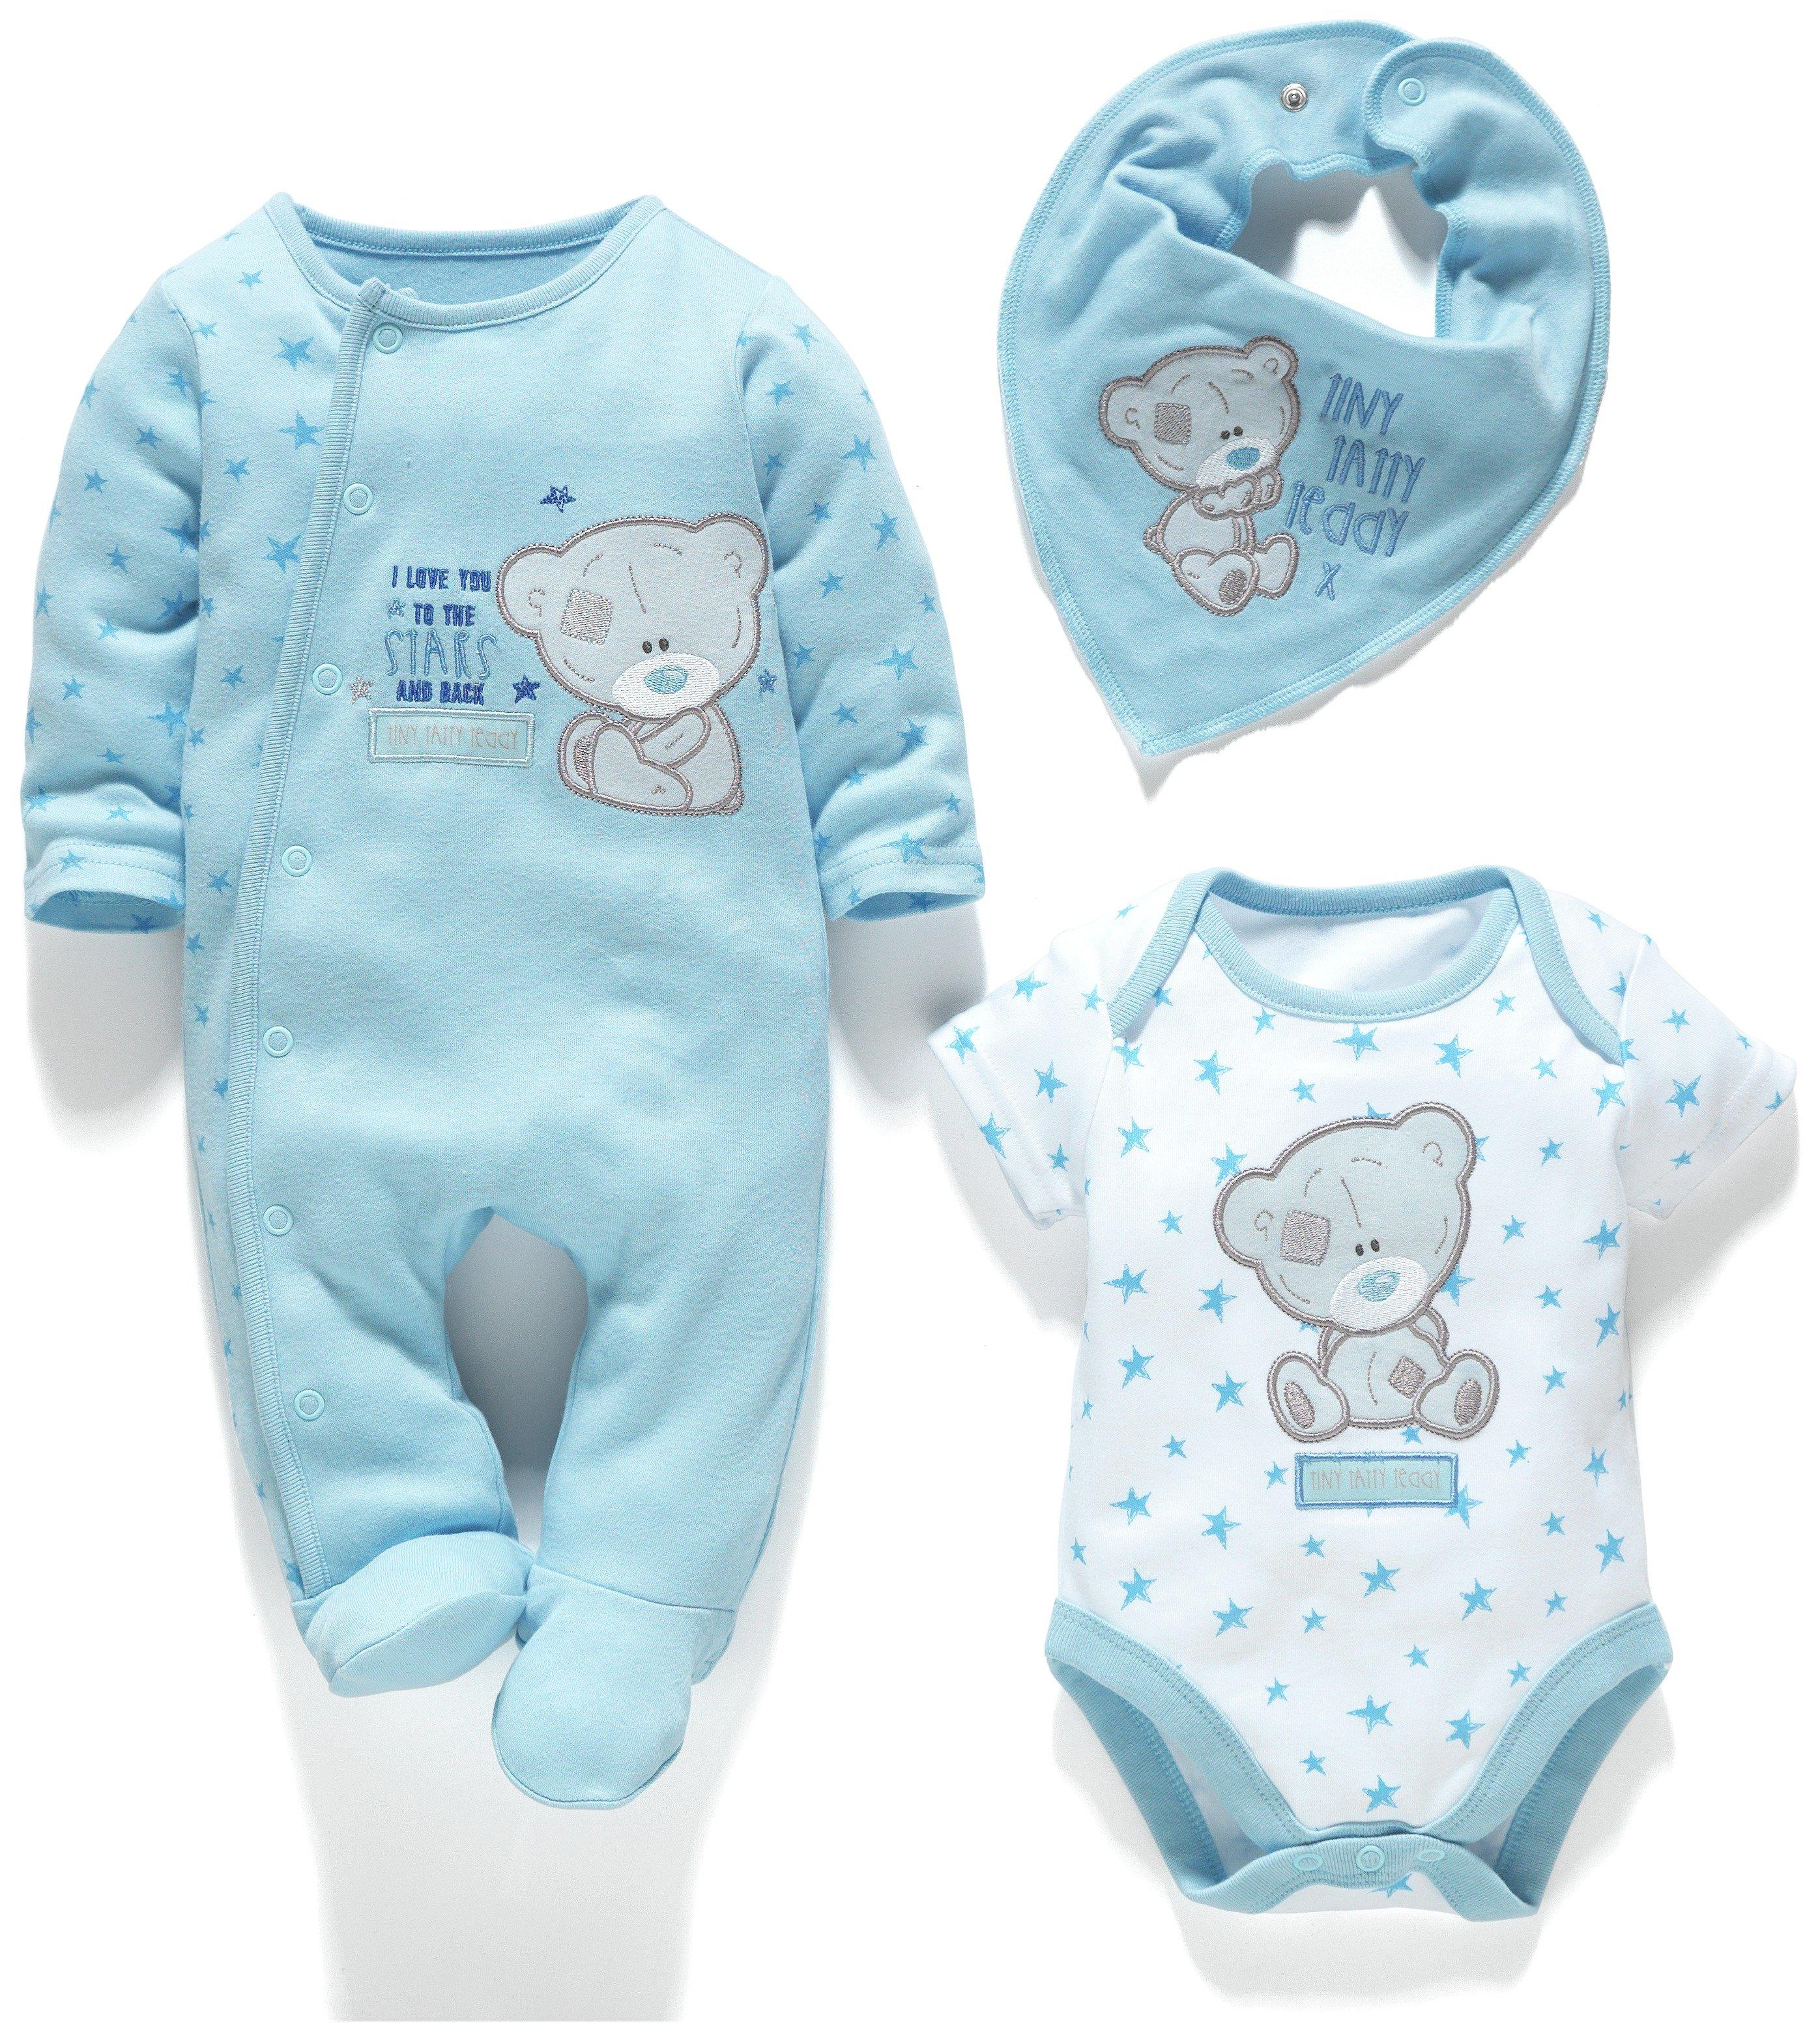 Image of Carte Blanch - Baby Tatty Teddy - Gift Set Blue - Newborn